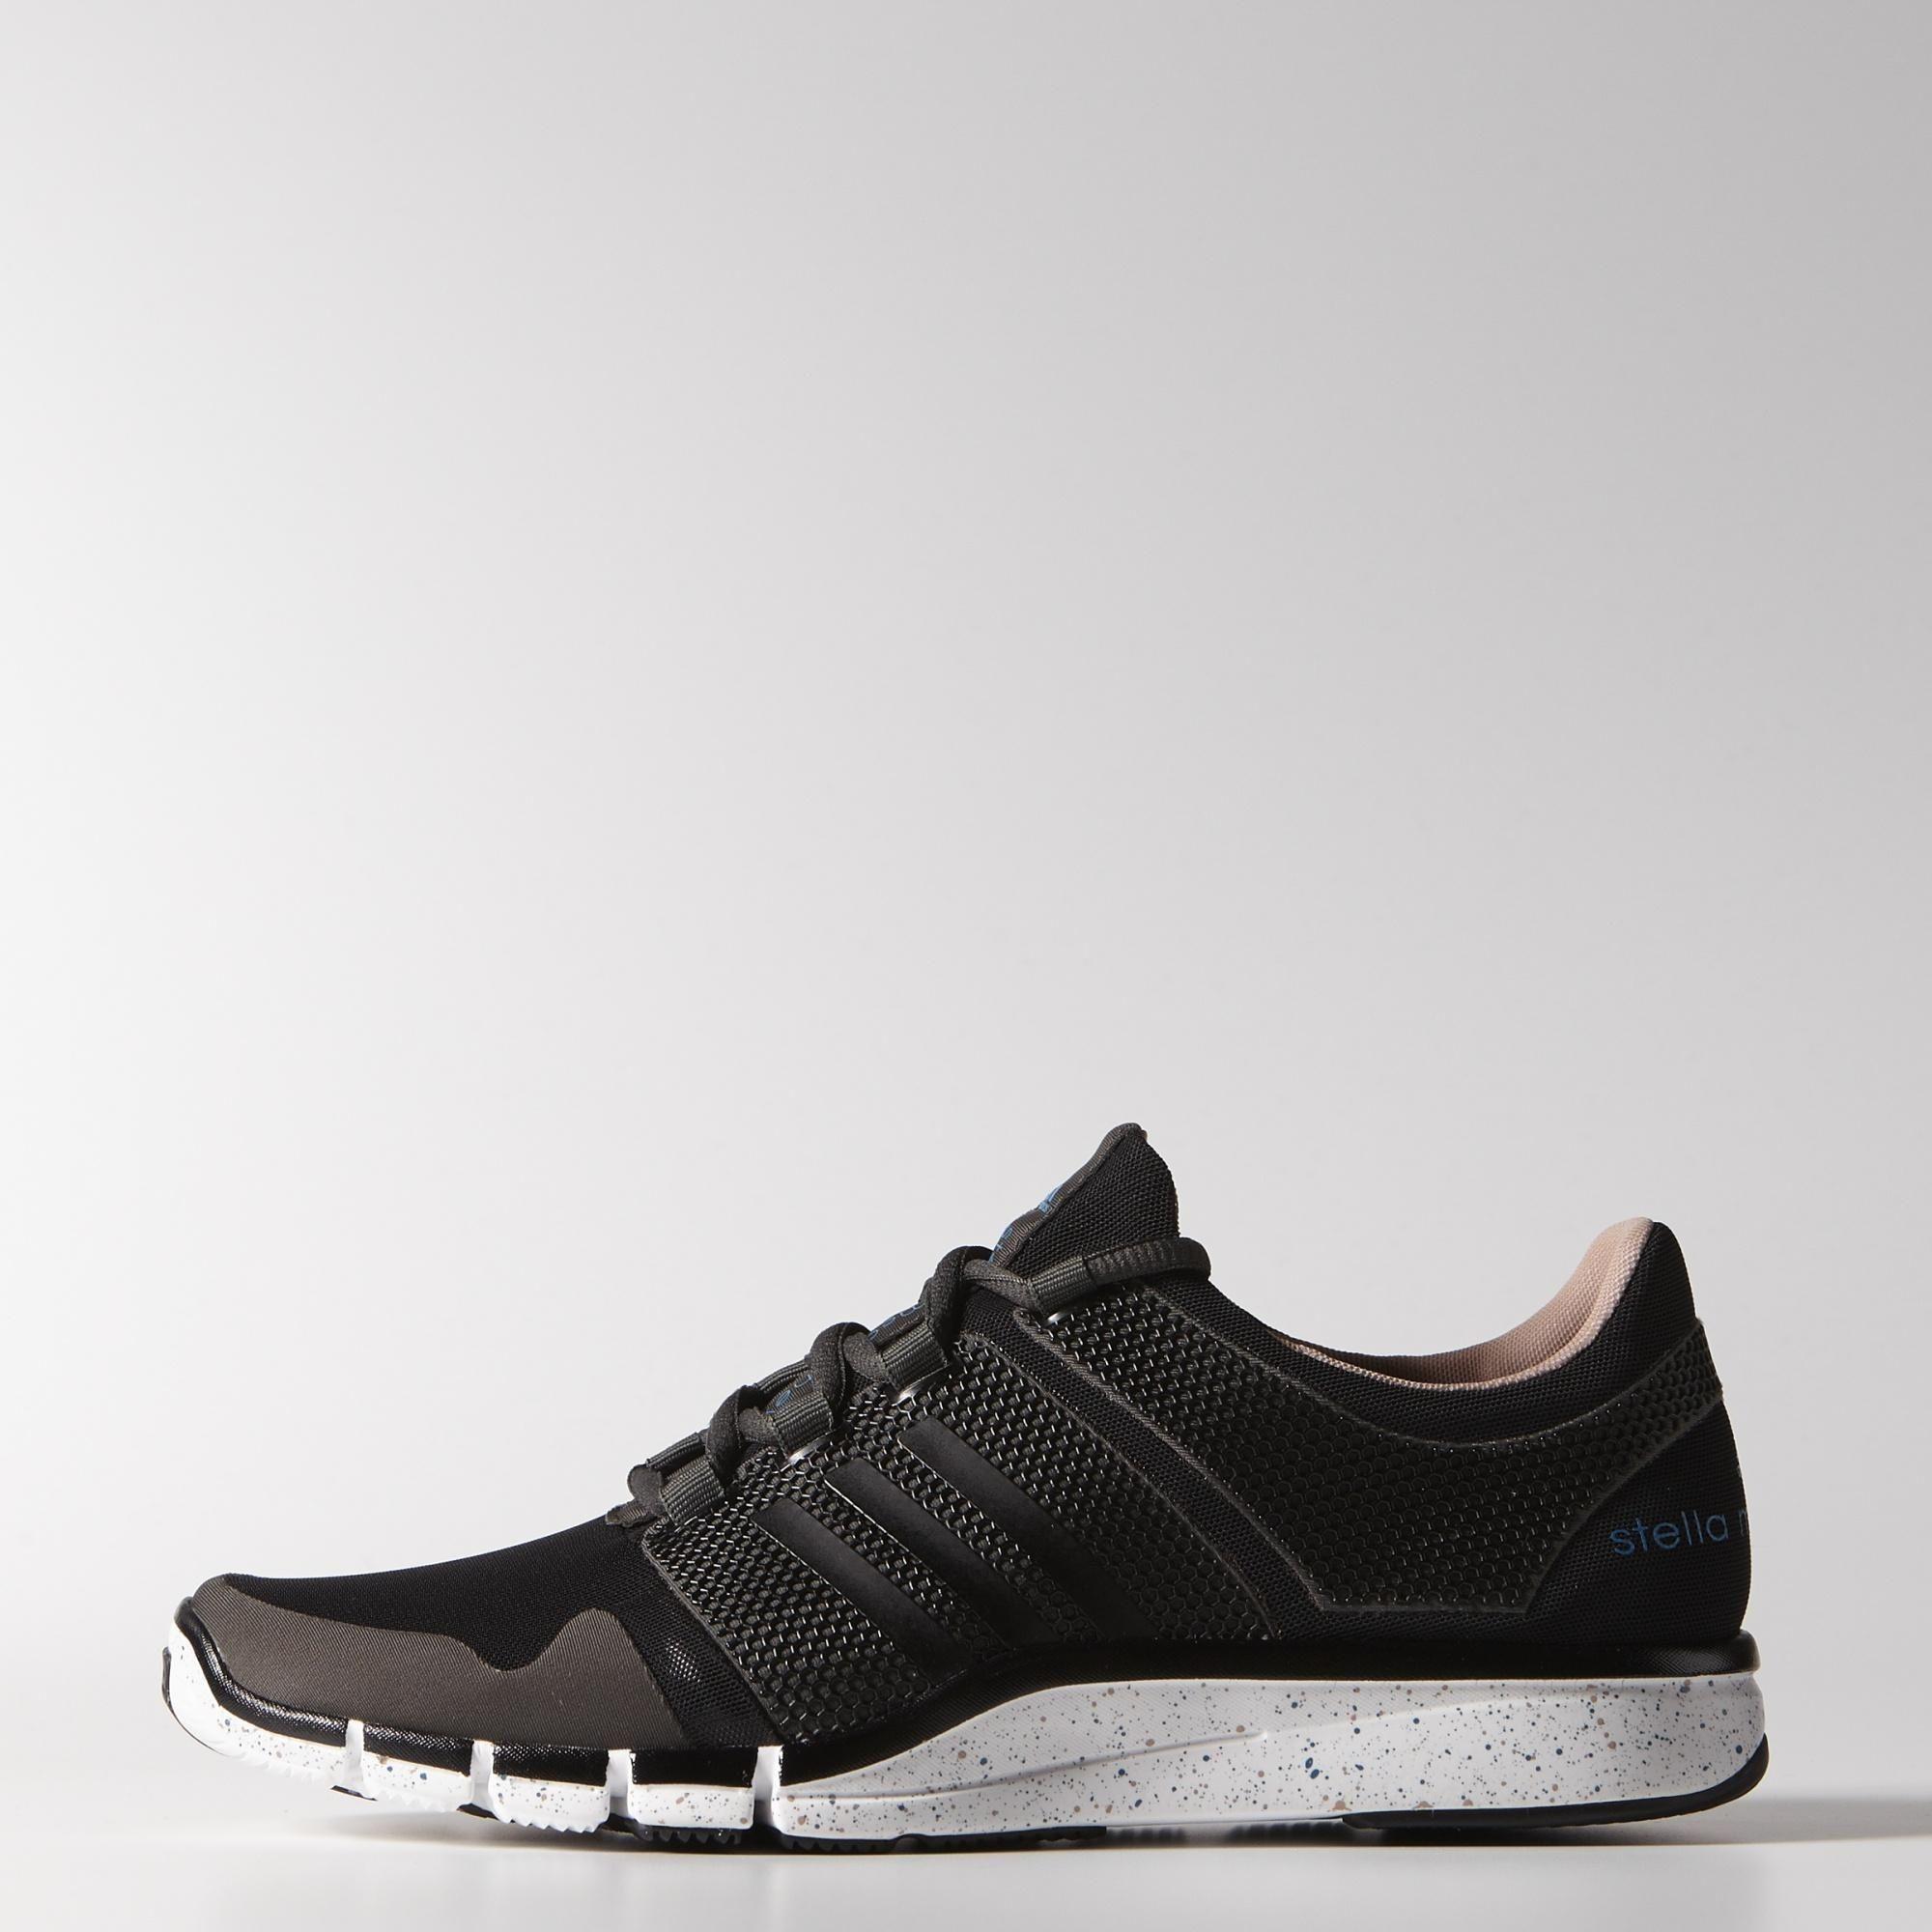 Adidas Climacool Adipure Schuh Adidas Deutschland Stella Mccartney Adidas Adidas Shoes